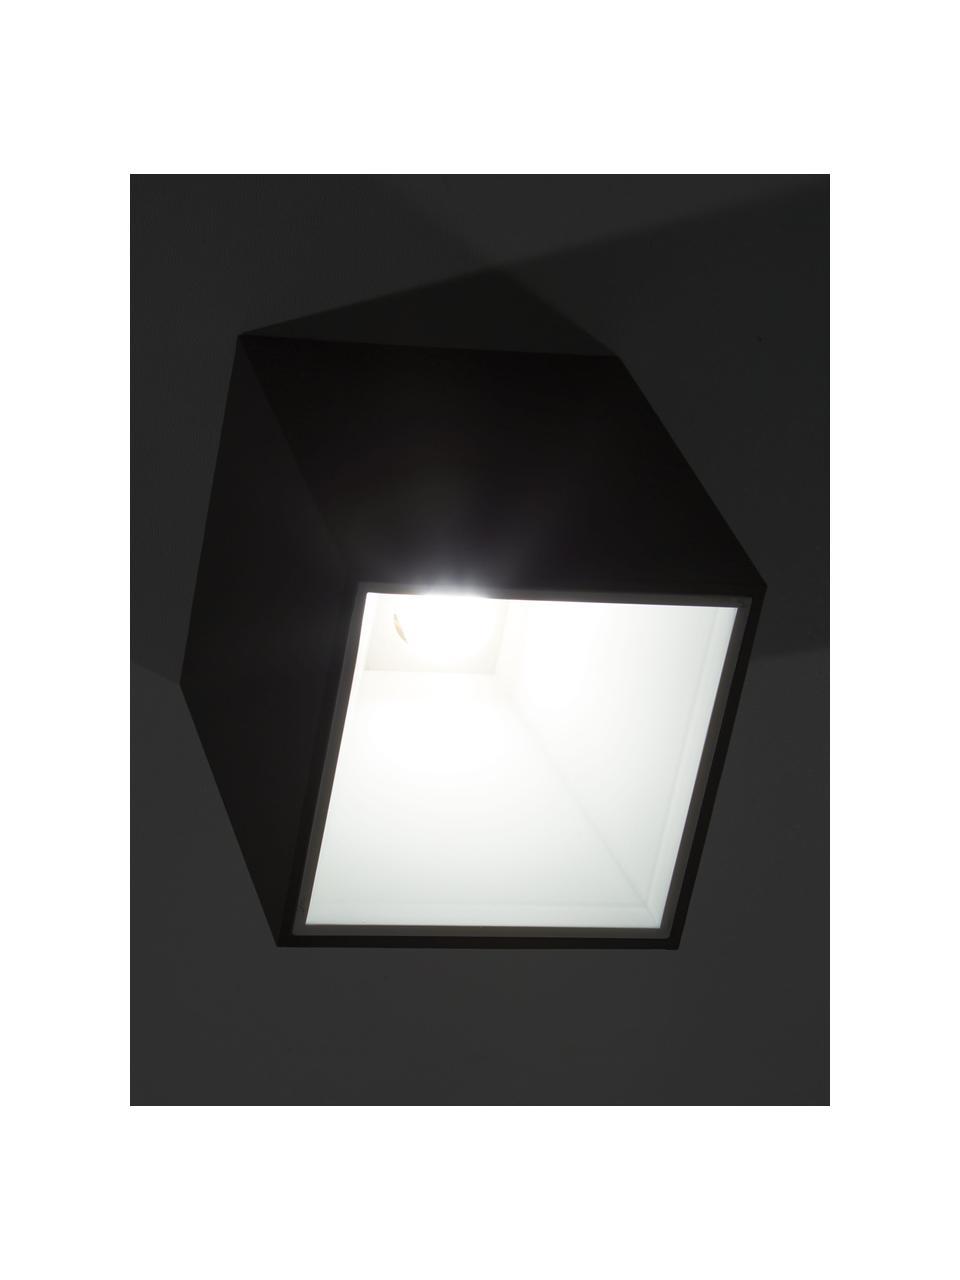 LED-Deckenspot Marty, Lampenschirm: Metall, pulverbeschichtet, Schwarz,Weiß, 10 x 12 cm